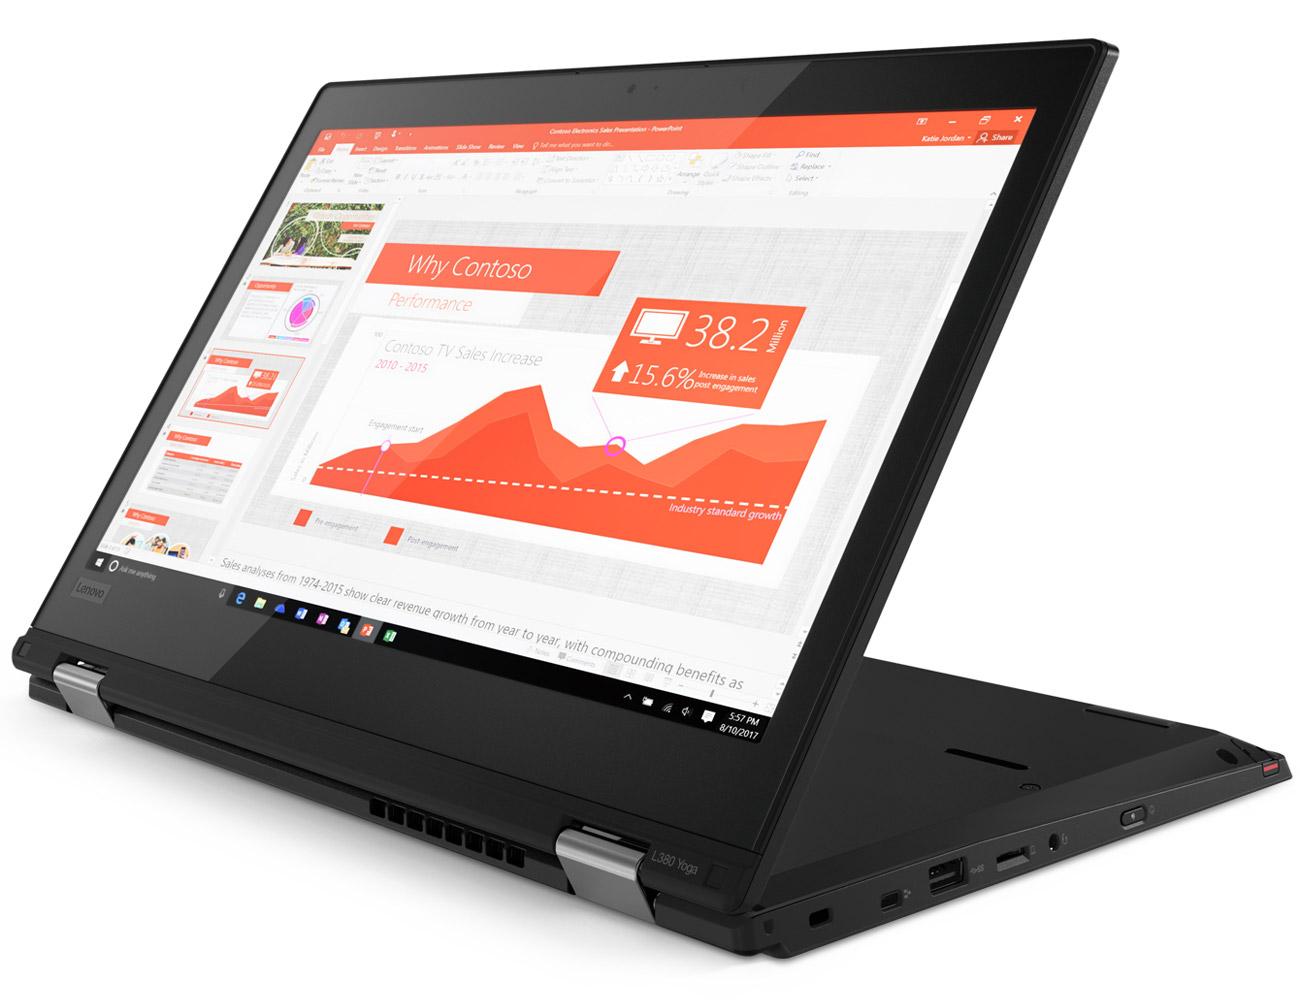 Lenovo-ThinkPad-L380-Yoga-лаптопи 2 в 1